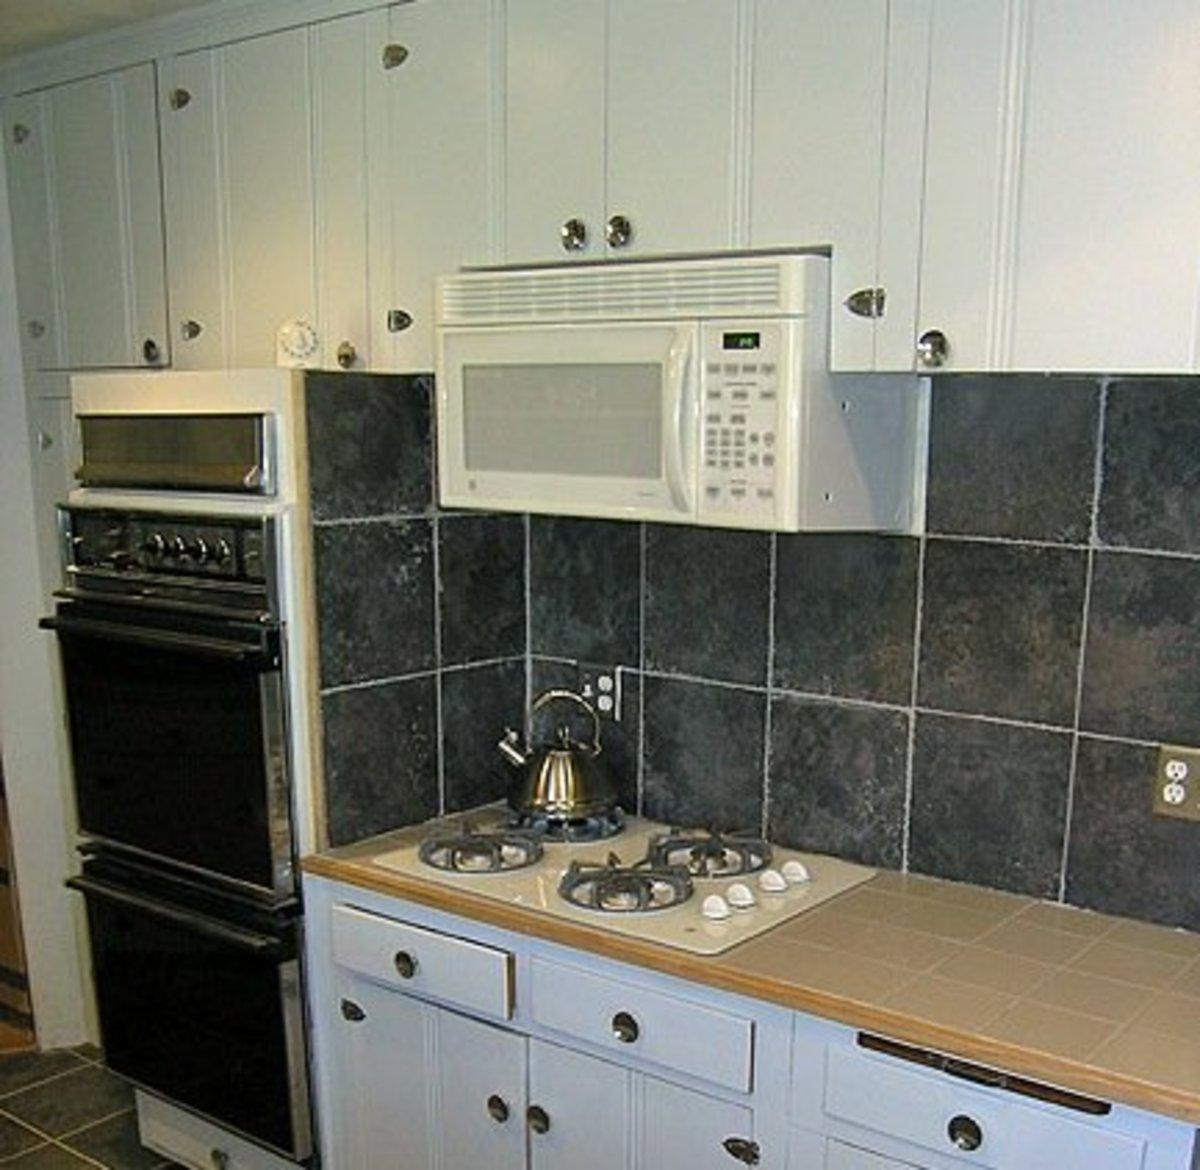 seven different microwave design ideas